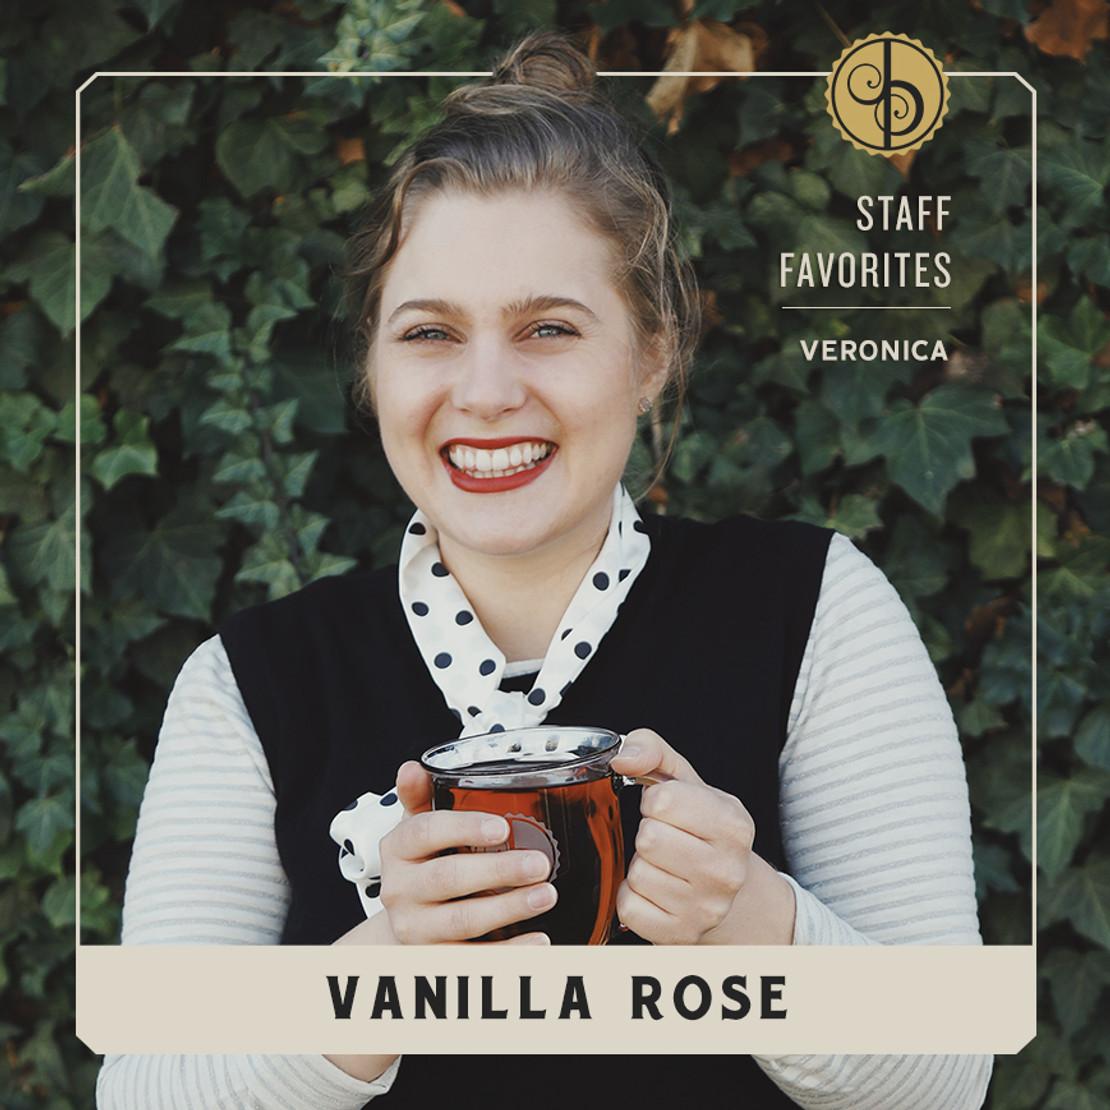 Staff Favorites: Veronica & Vanilla Rose